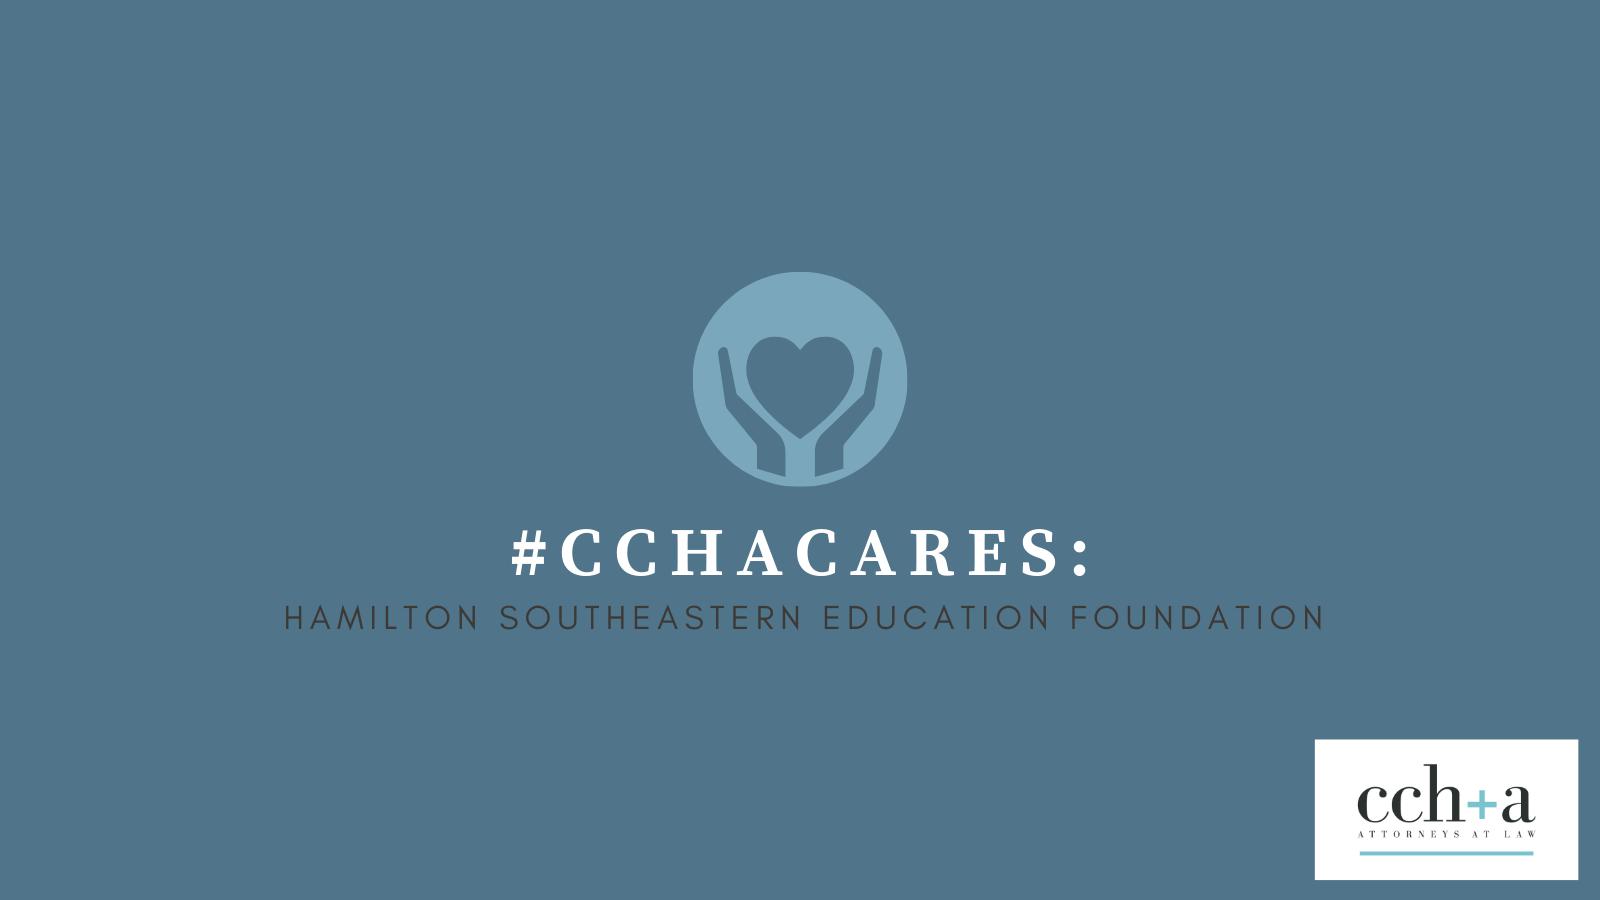 CCHA Cares Hamilton Southeastern Education Foundation Twitter